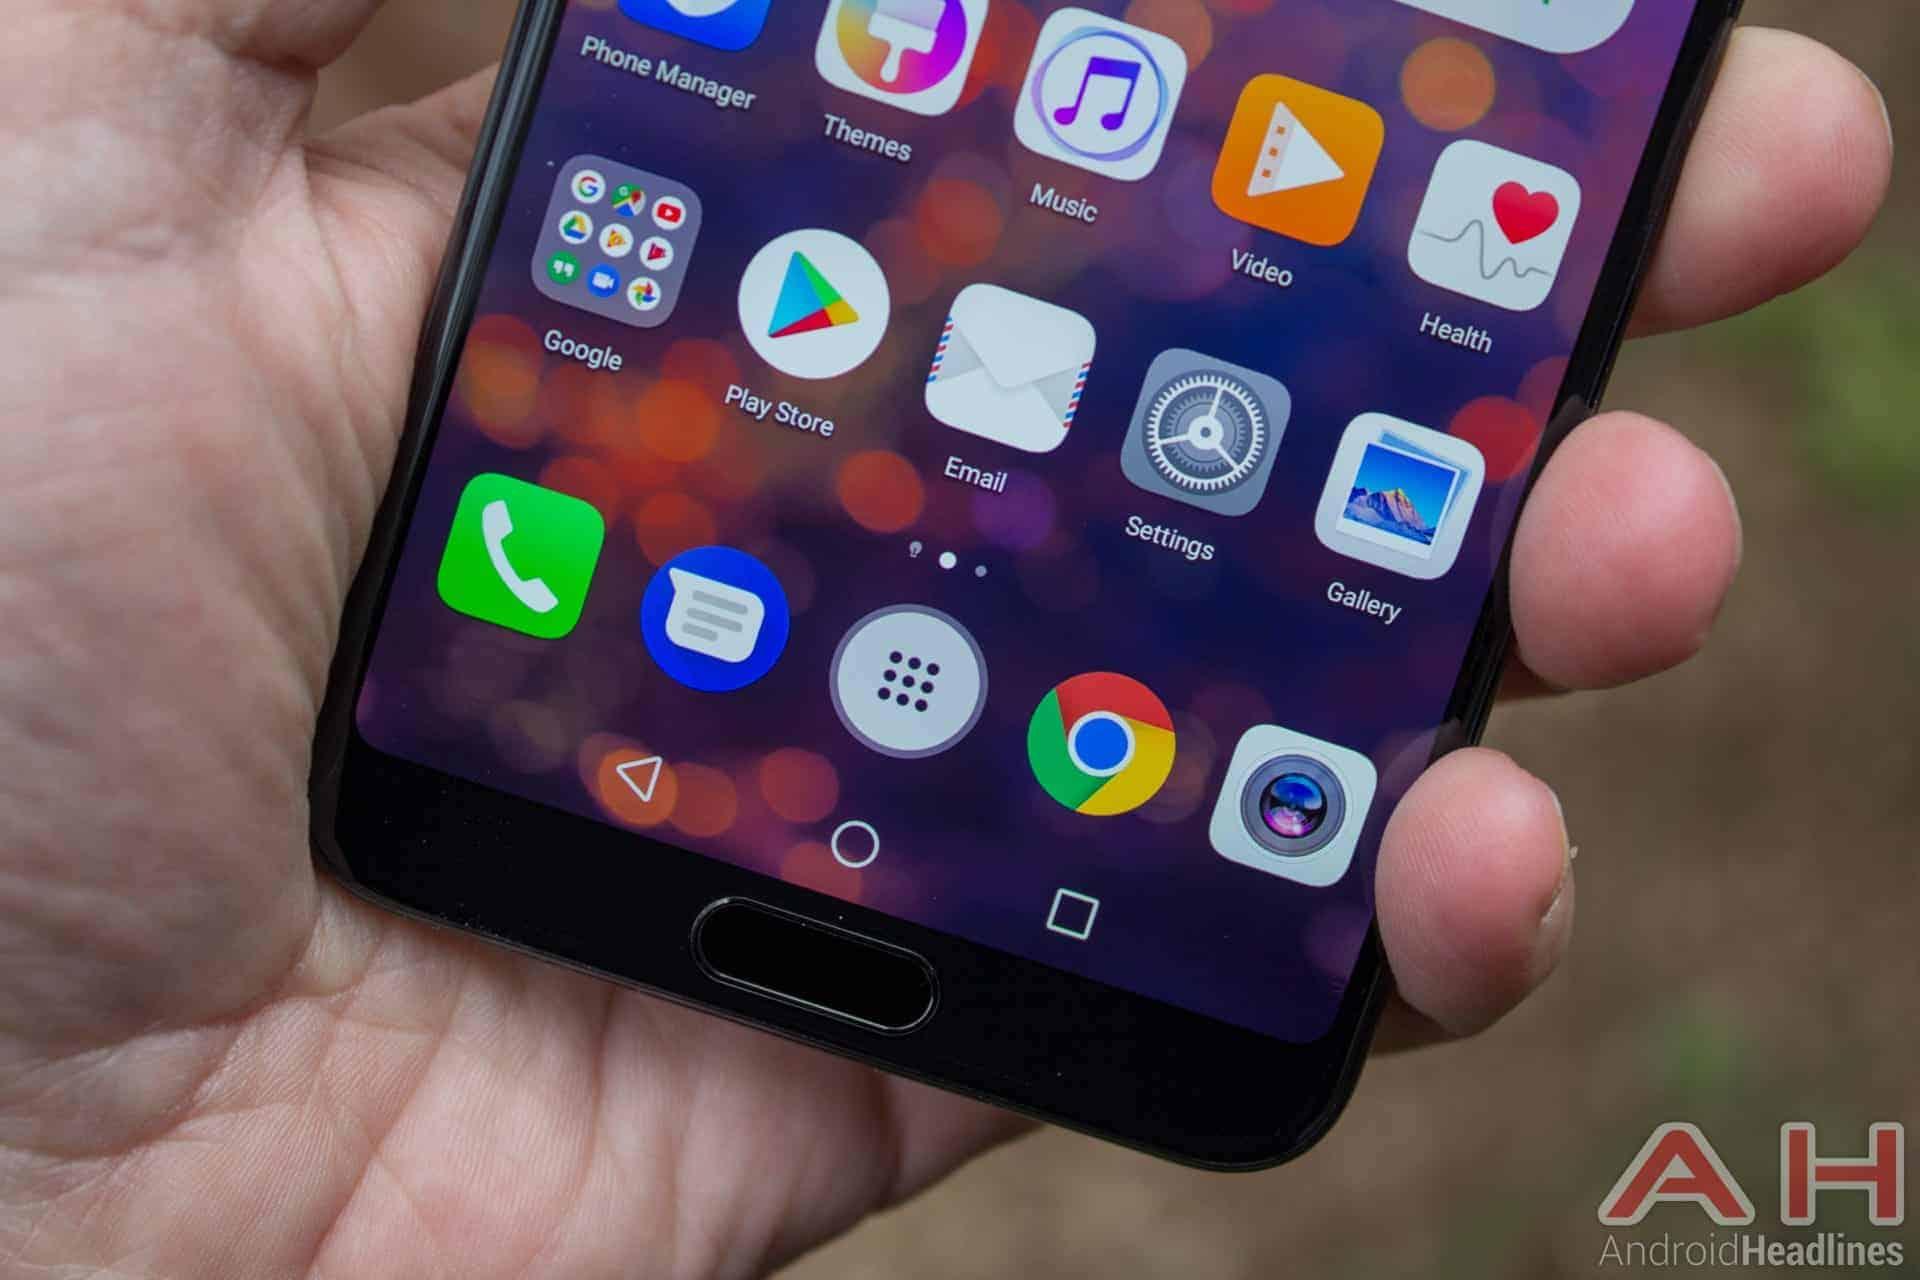 Huawei P20 Pro AH NS 25 fingerprint scanner chin